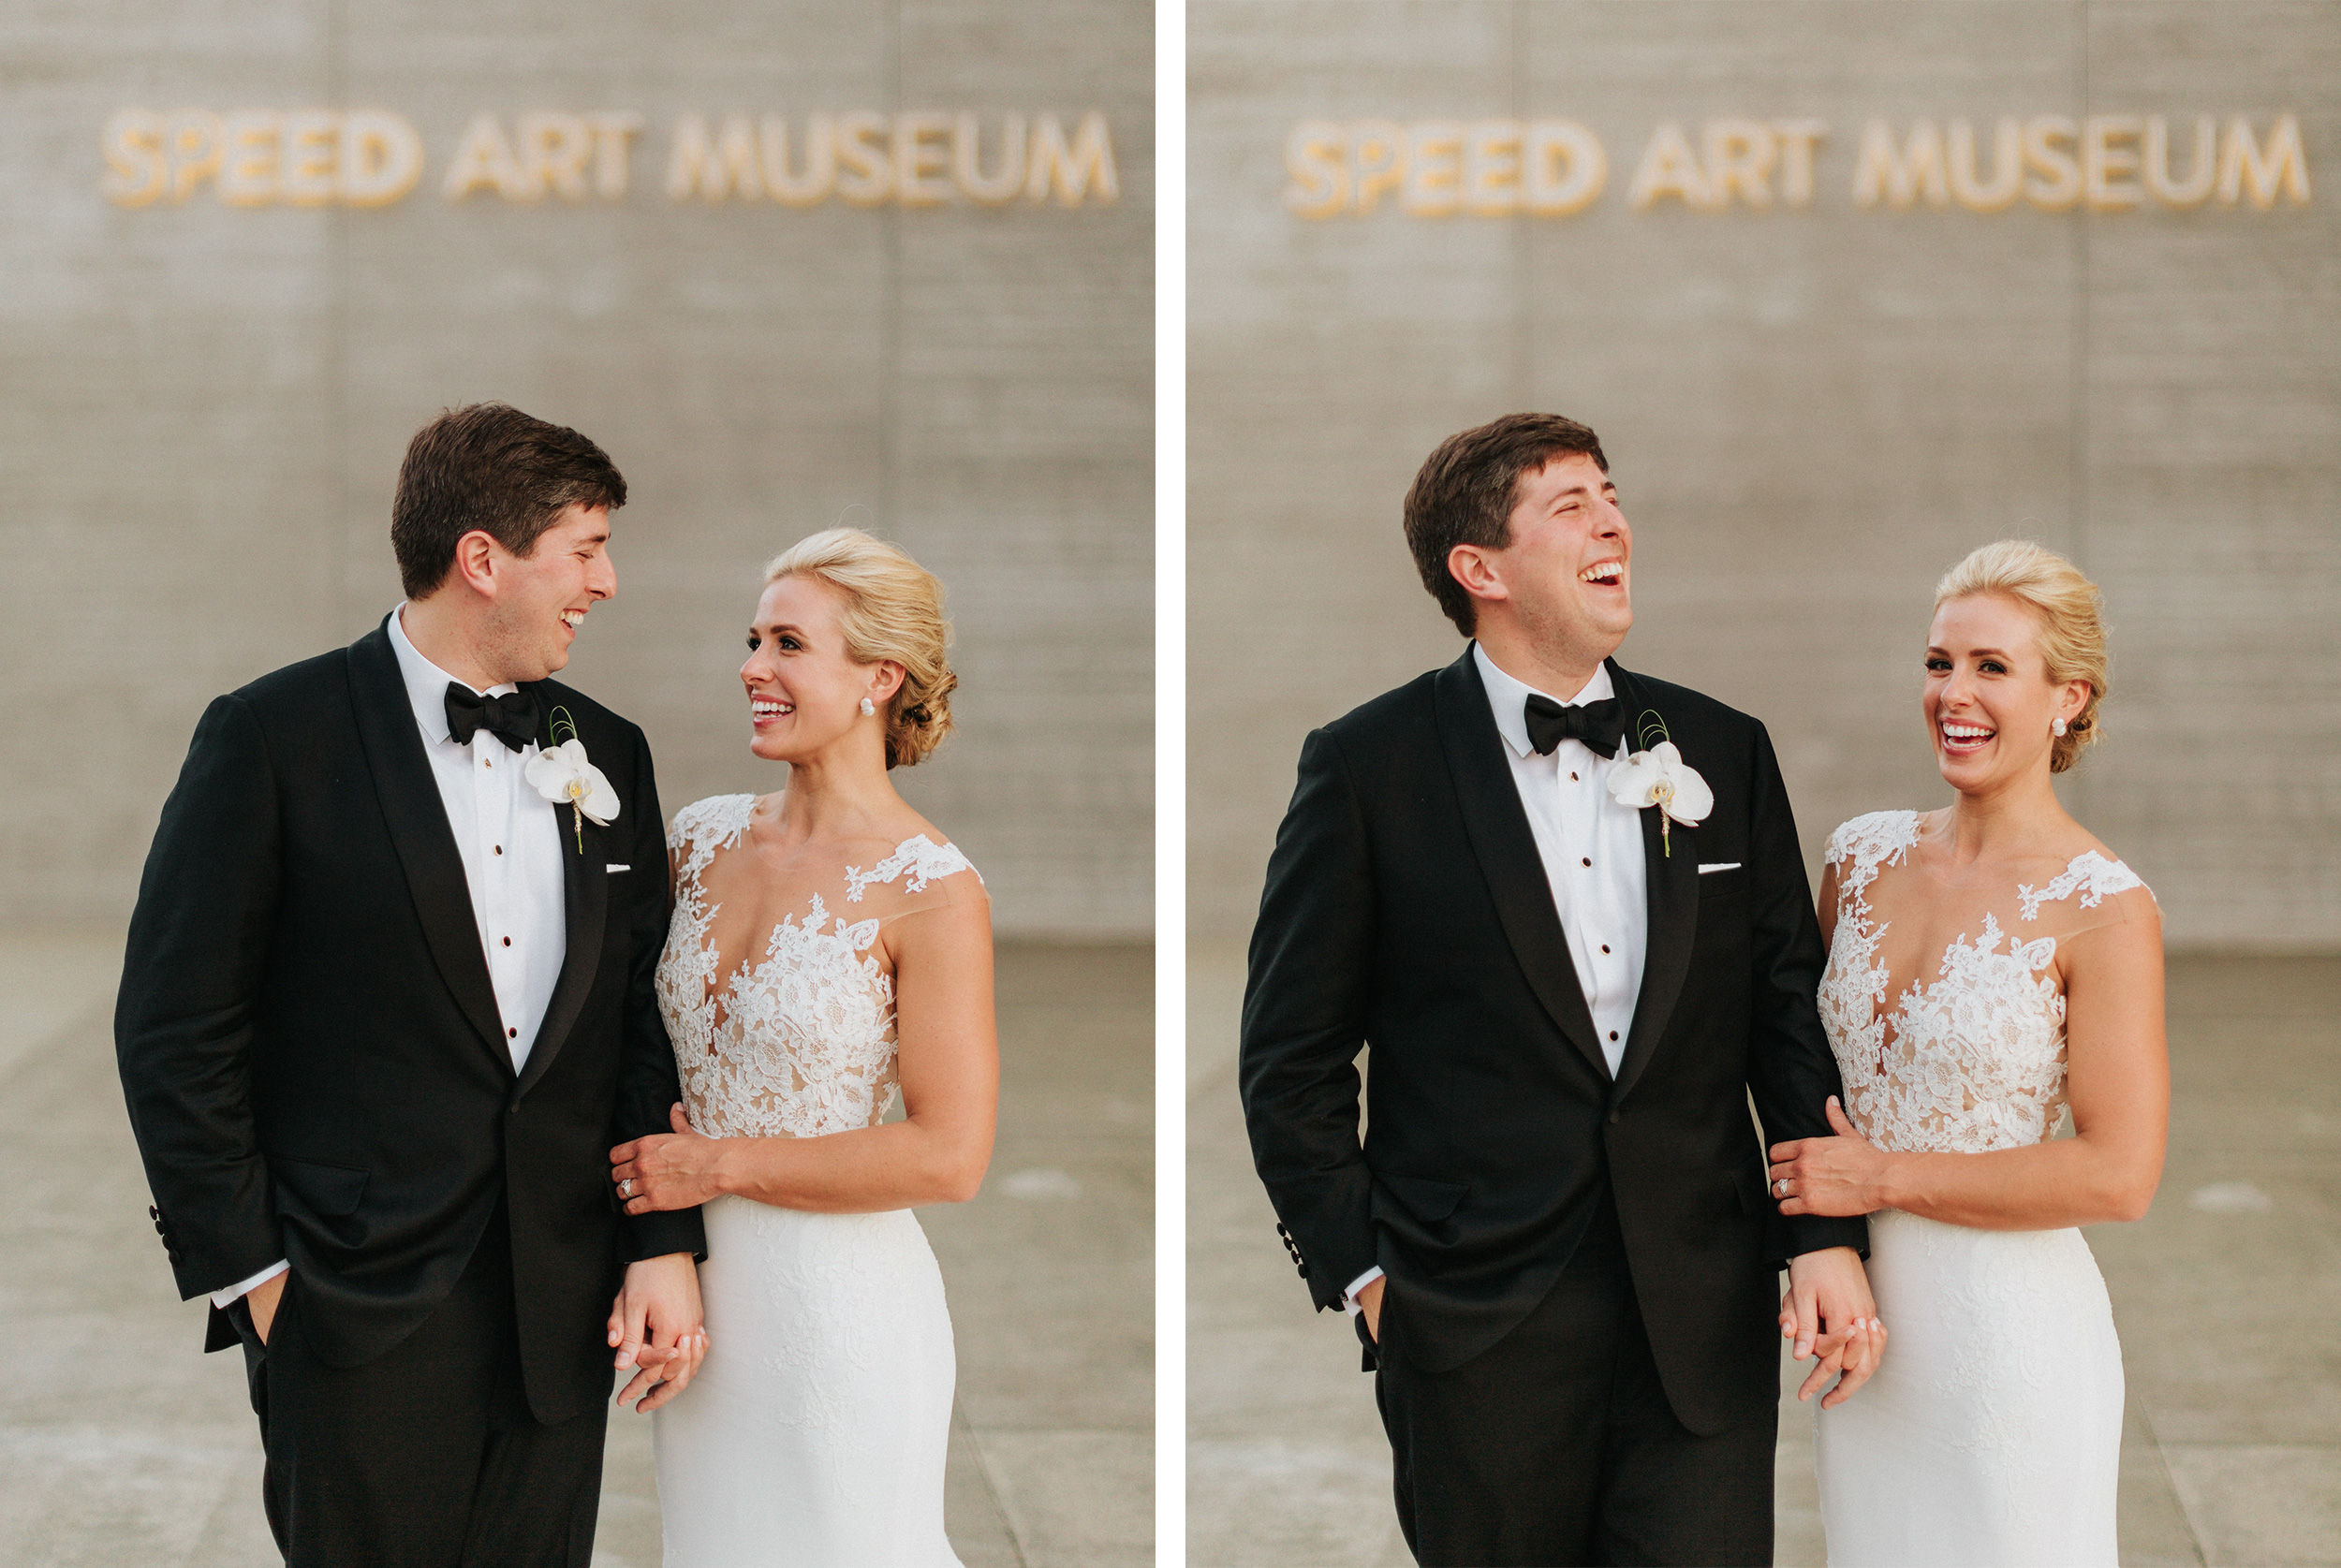 speed-art-museum-wedding-photographer-21.JPG